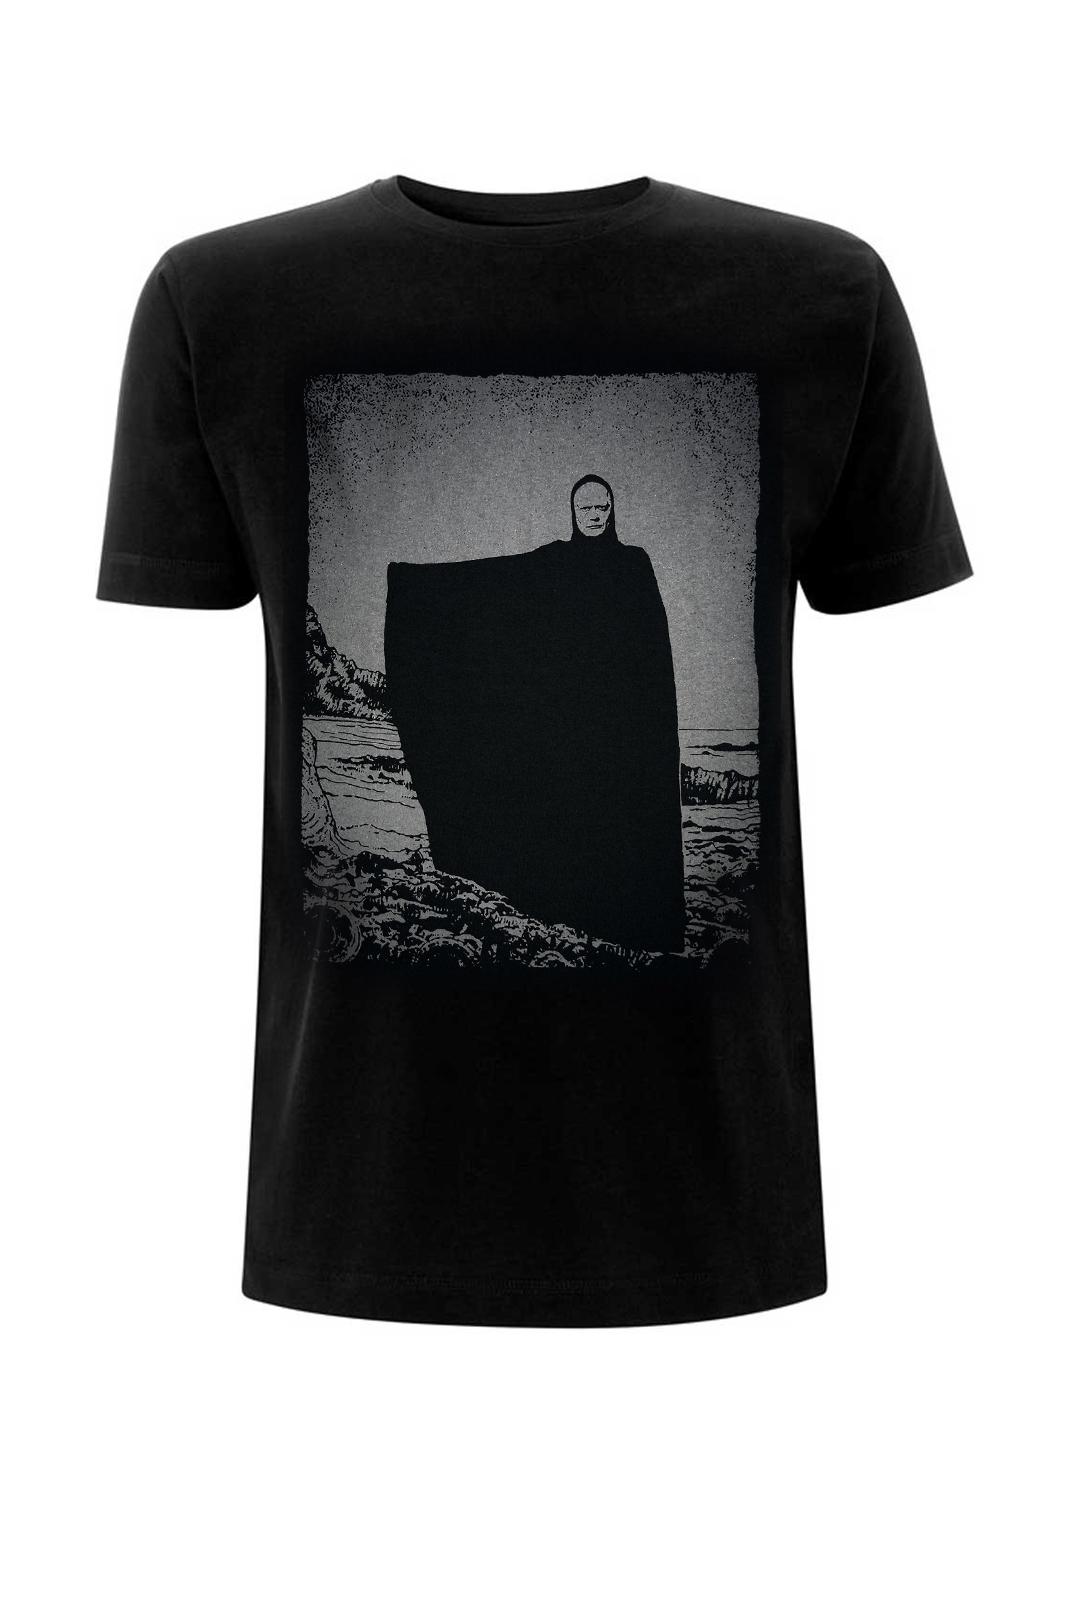 Tee Death 7th Seal Black